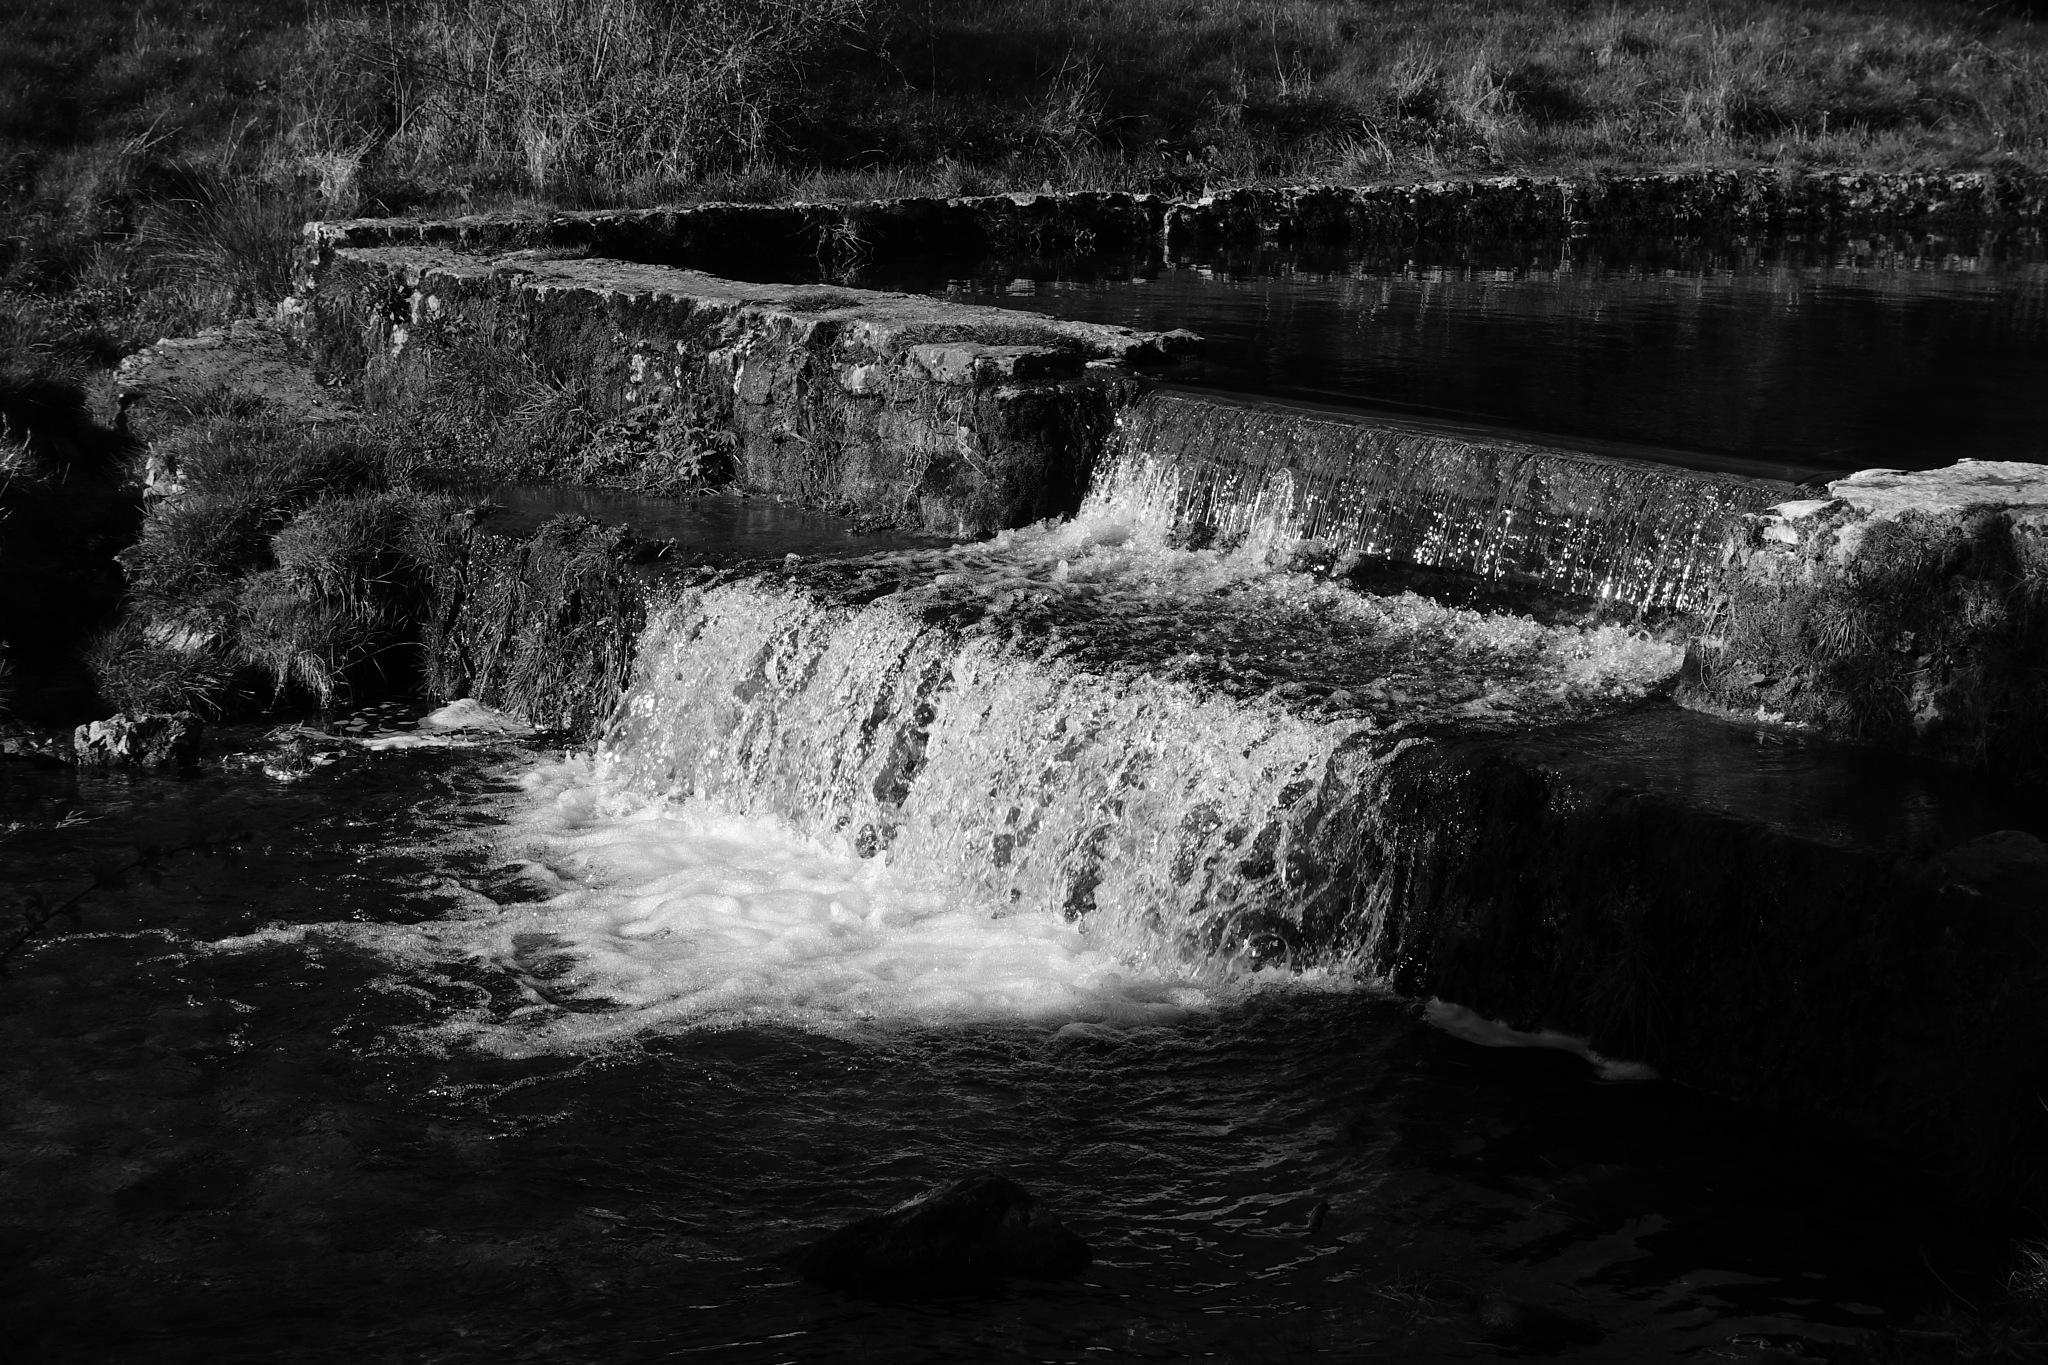 Rapids by Rich66